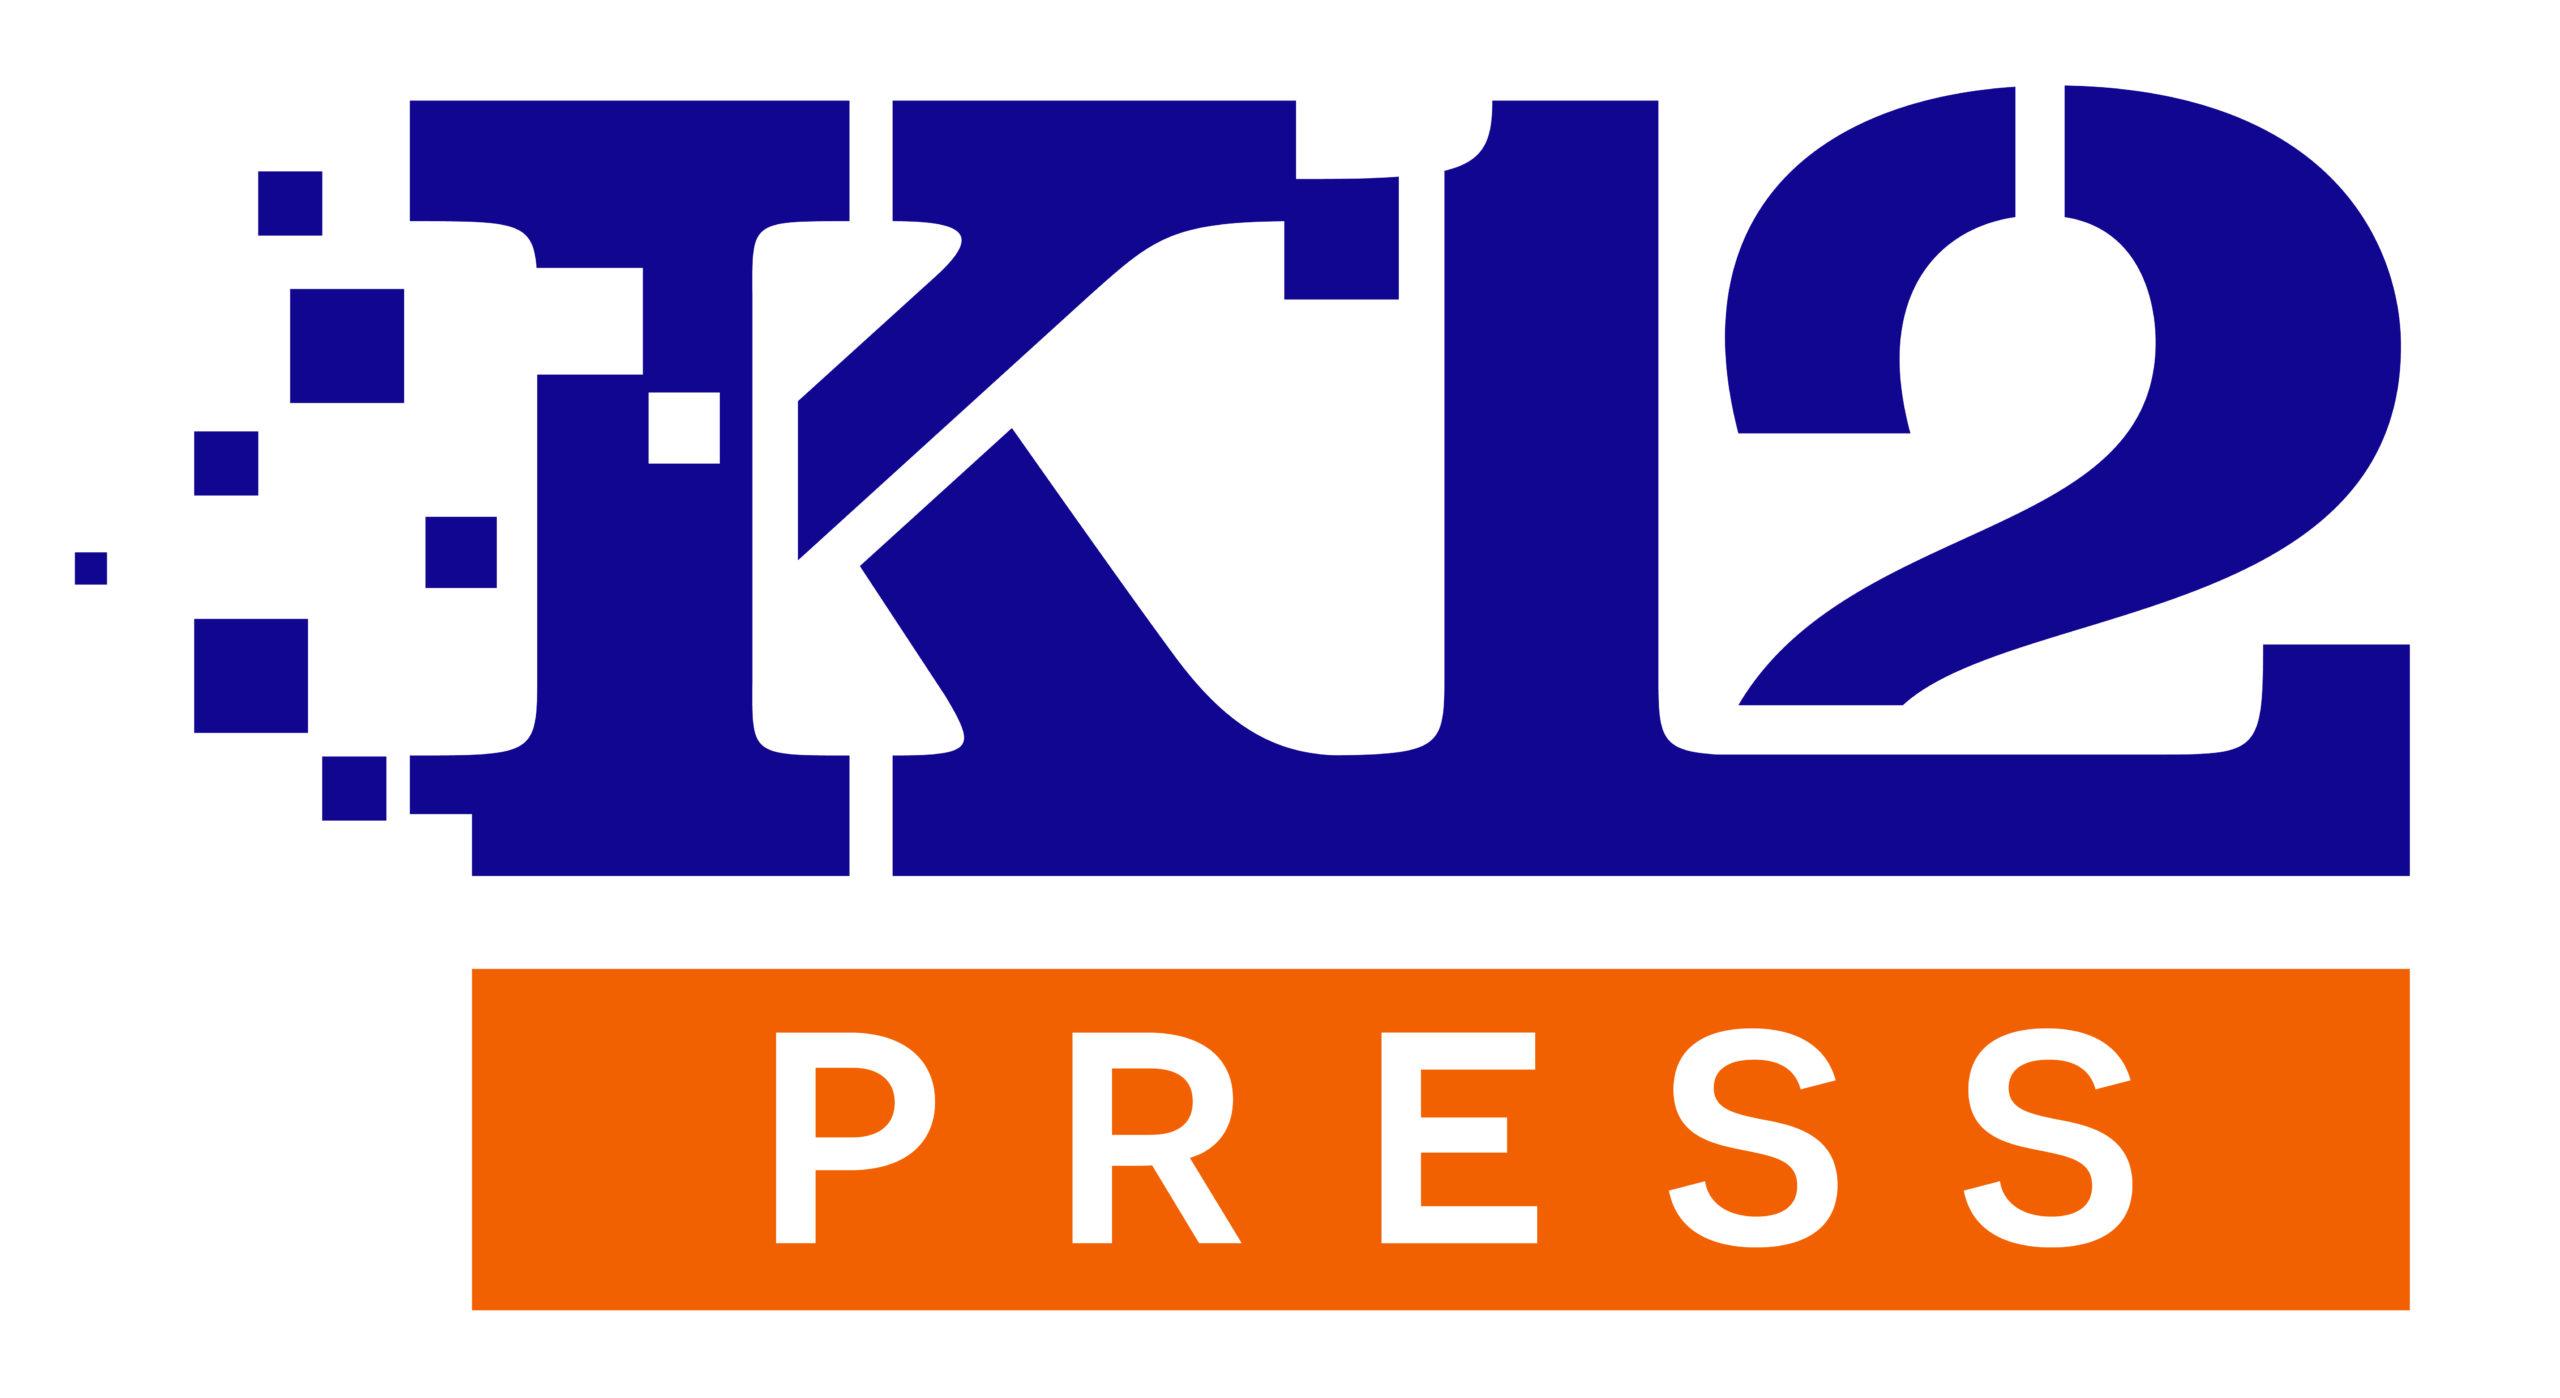 K12press